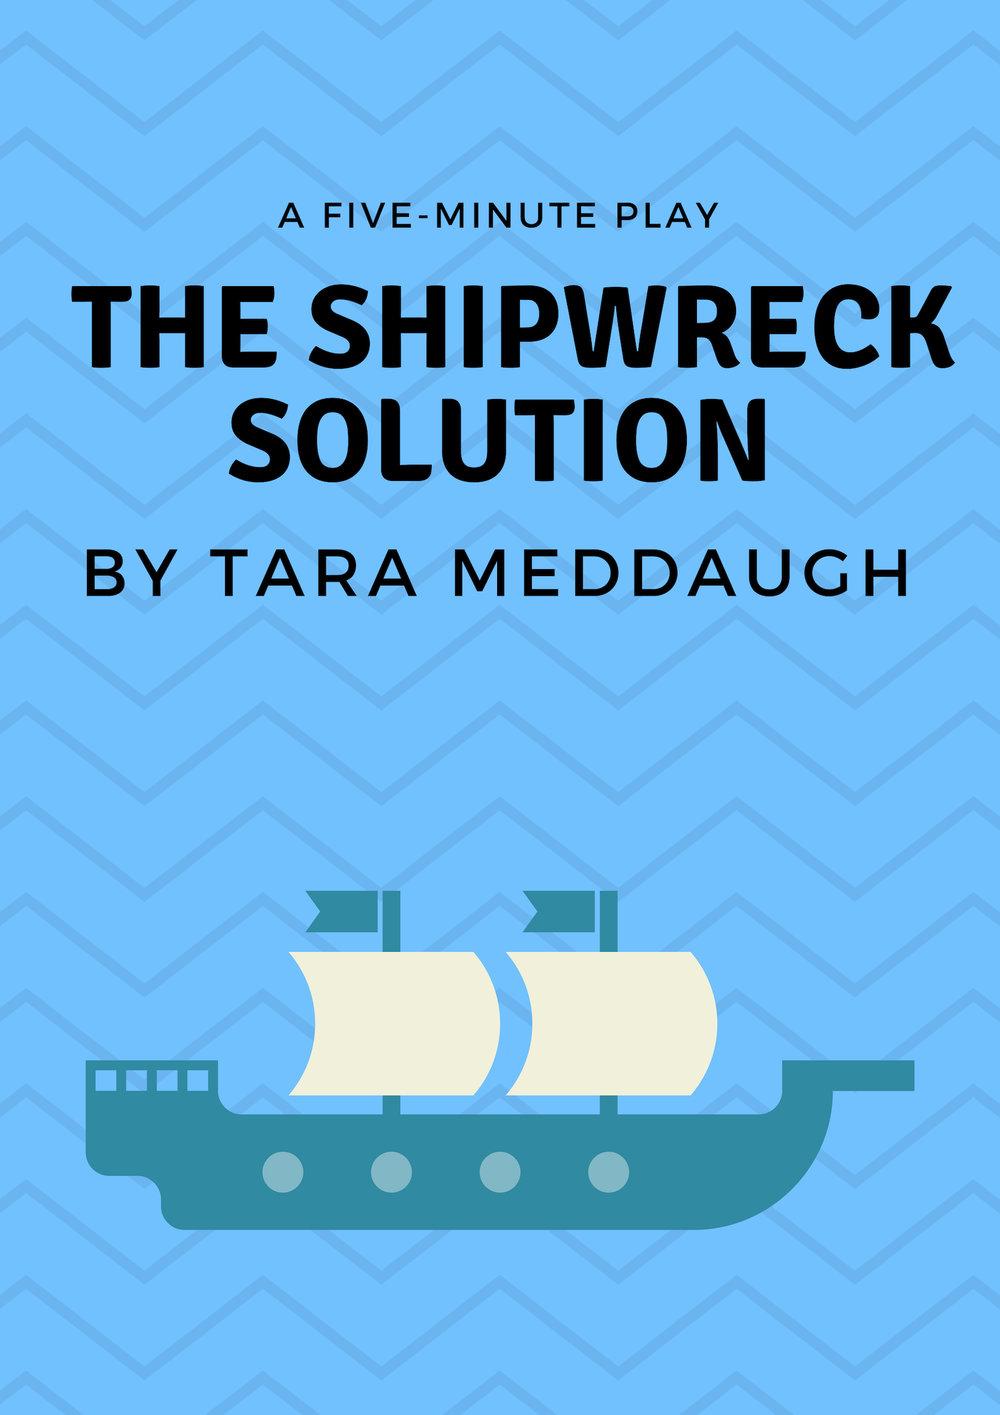 The Shipwreck Solution.jpg